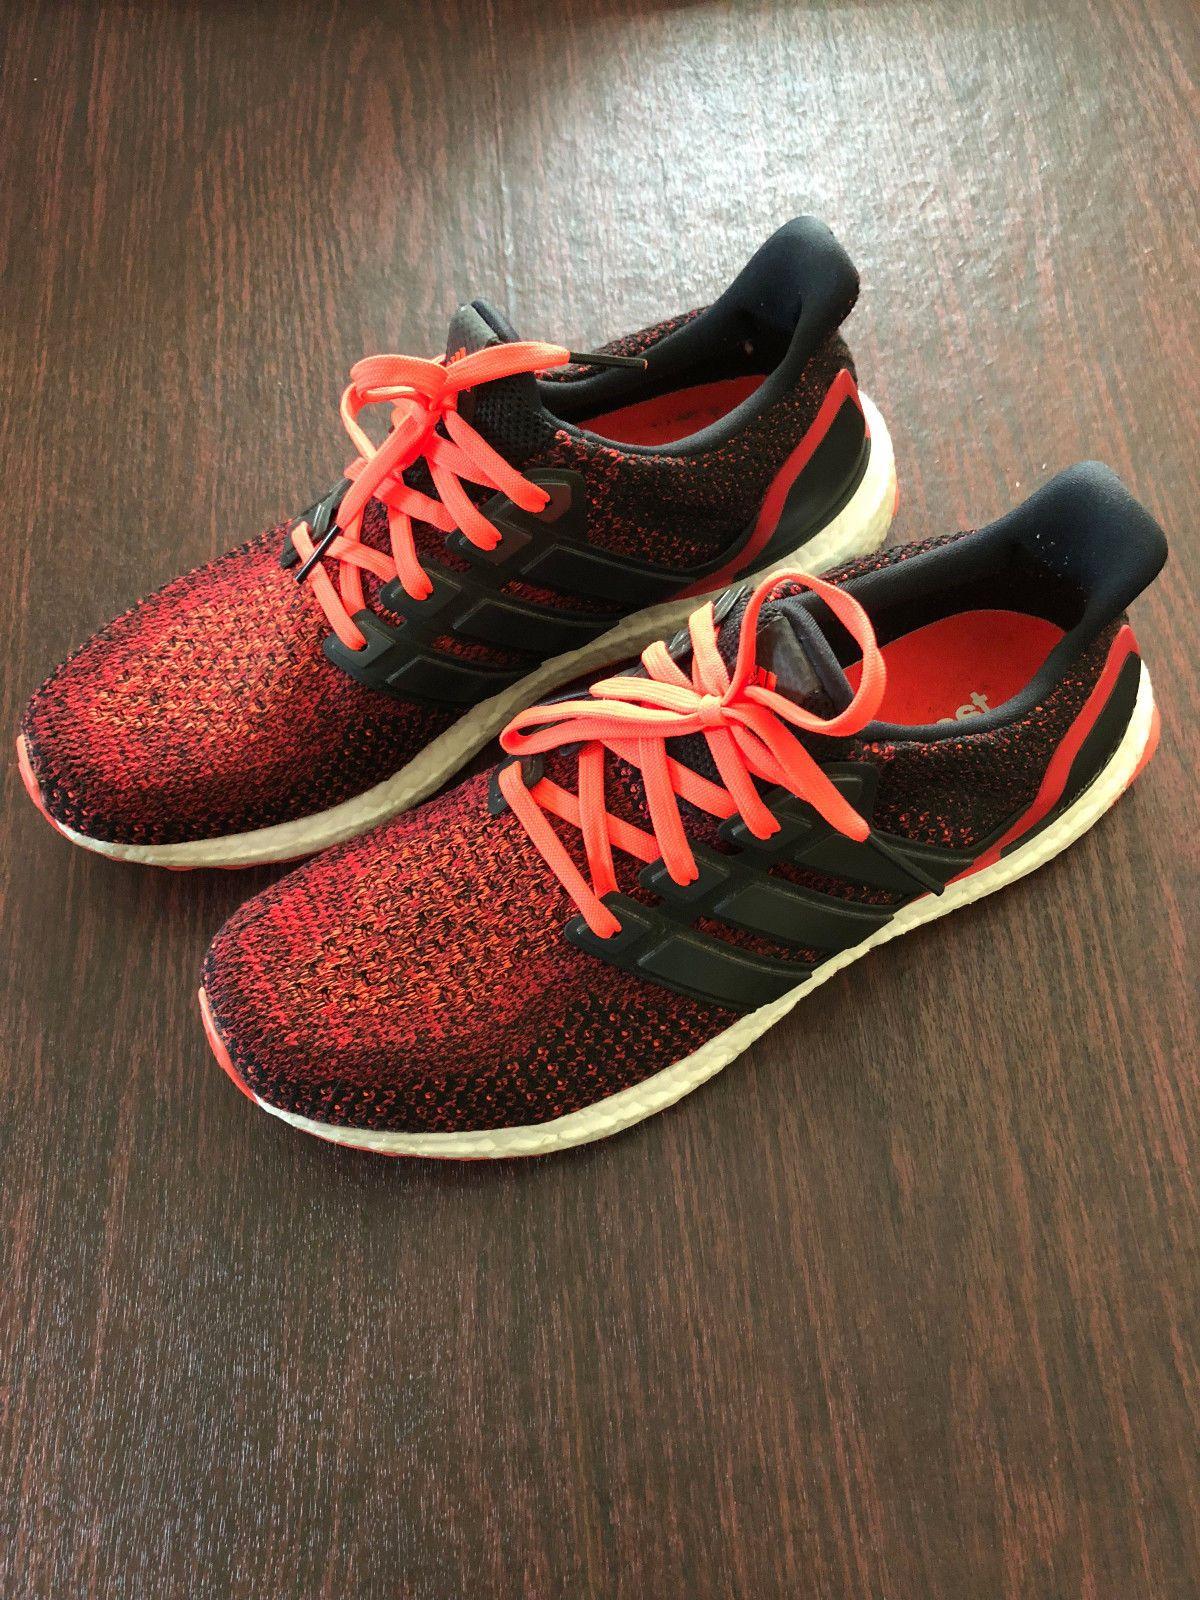 8392059af607d Adidas Ultra Boost 2.0 Solar Red Core Black AQ5930 US Size 10.5 Ultraboost